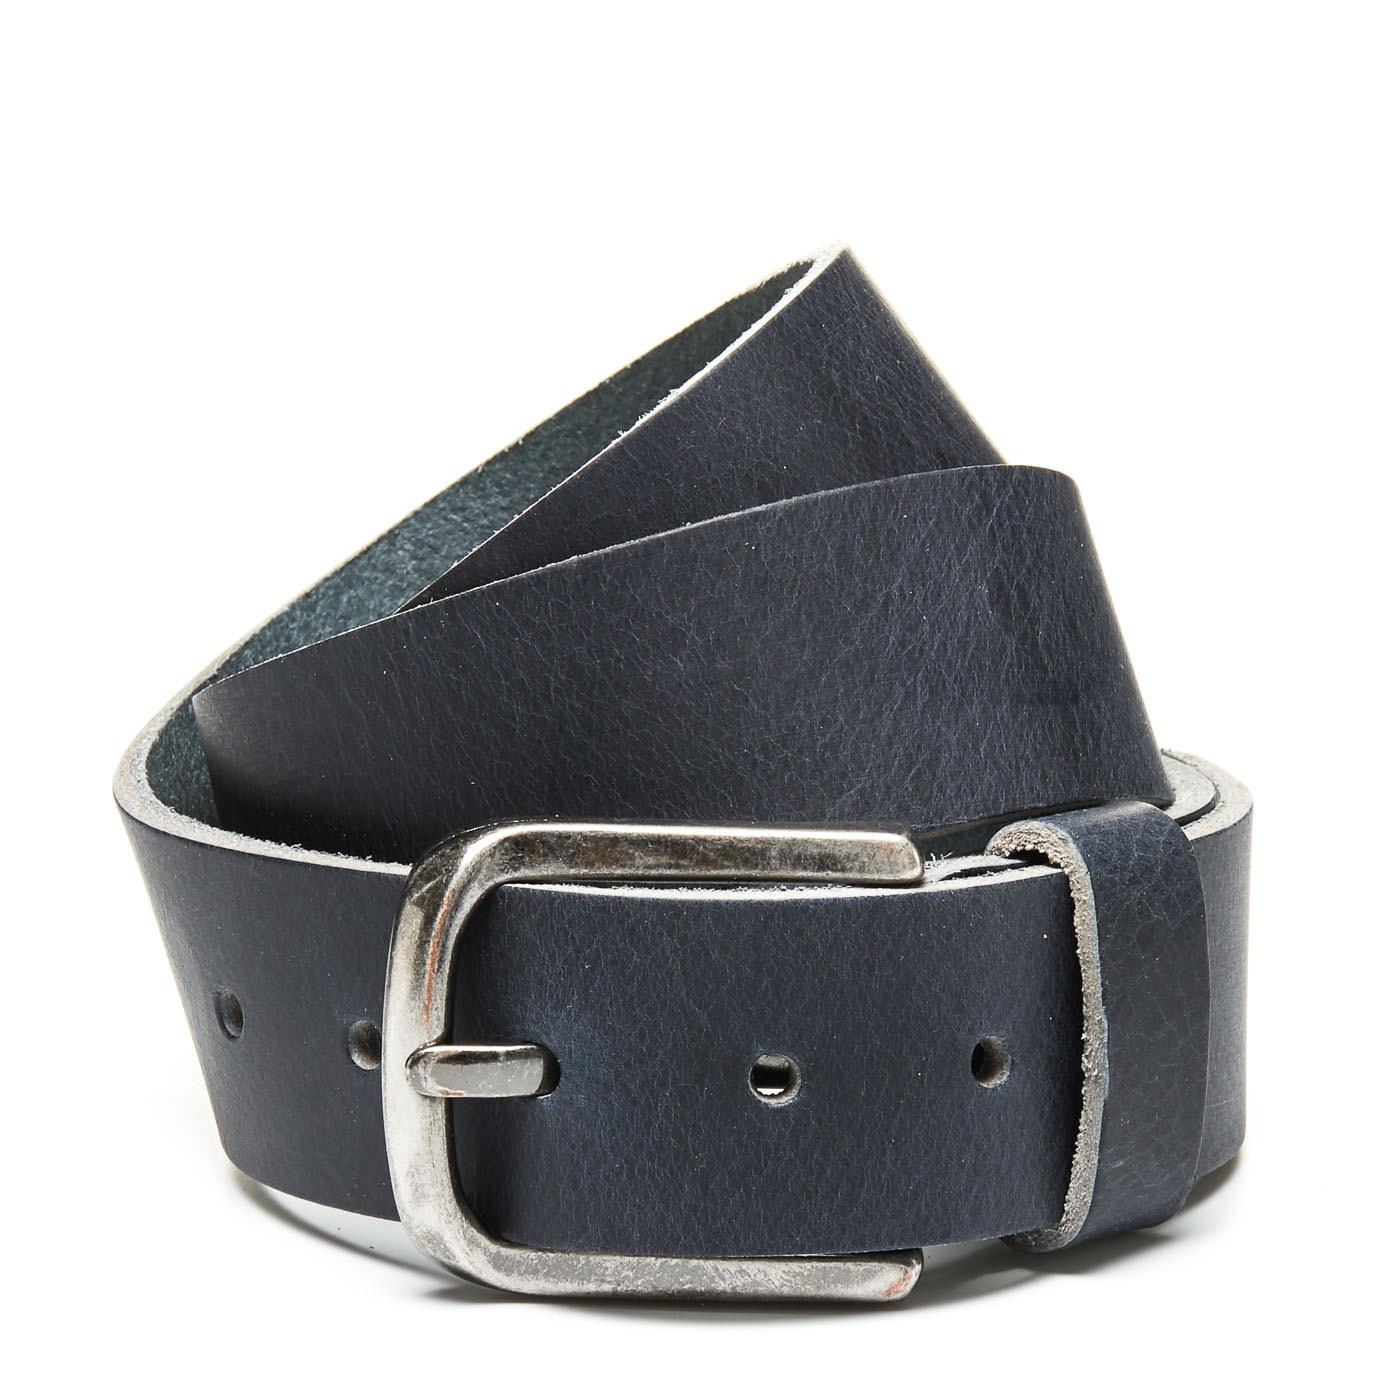 Cowboysbelt Blue Unisex Riem 403001-000800